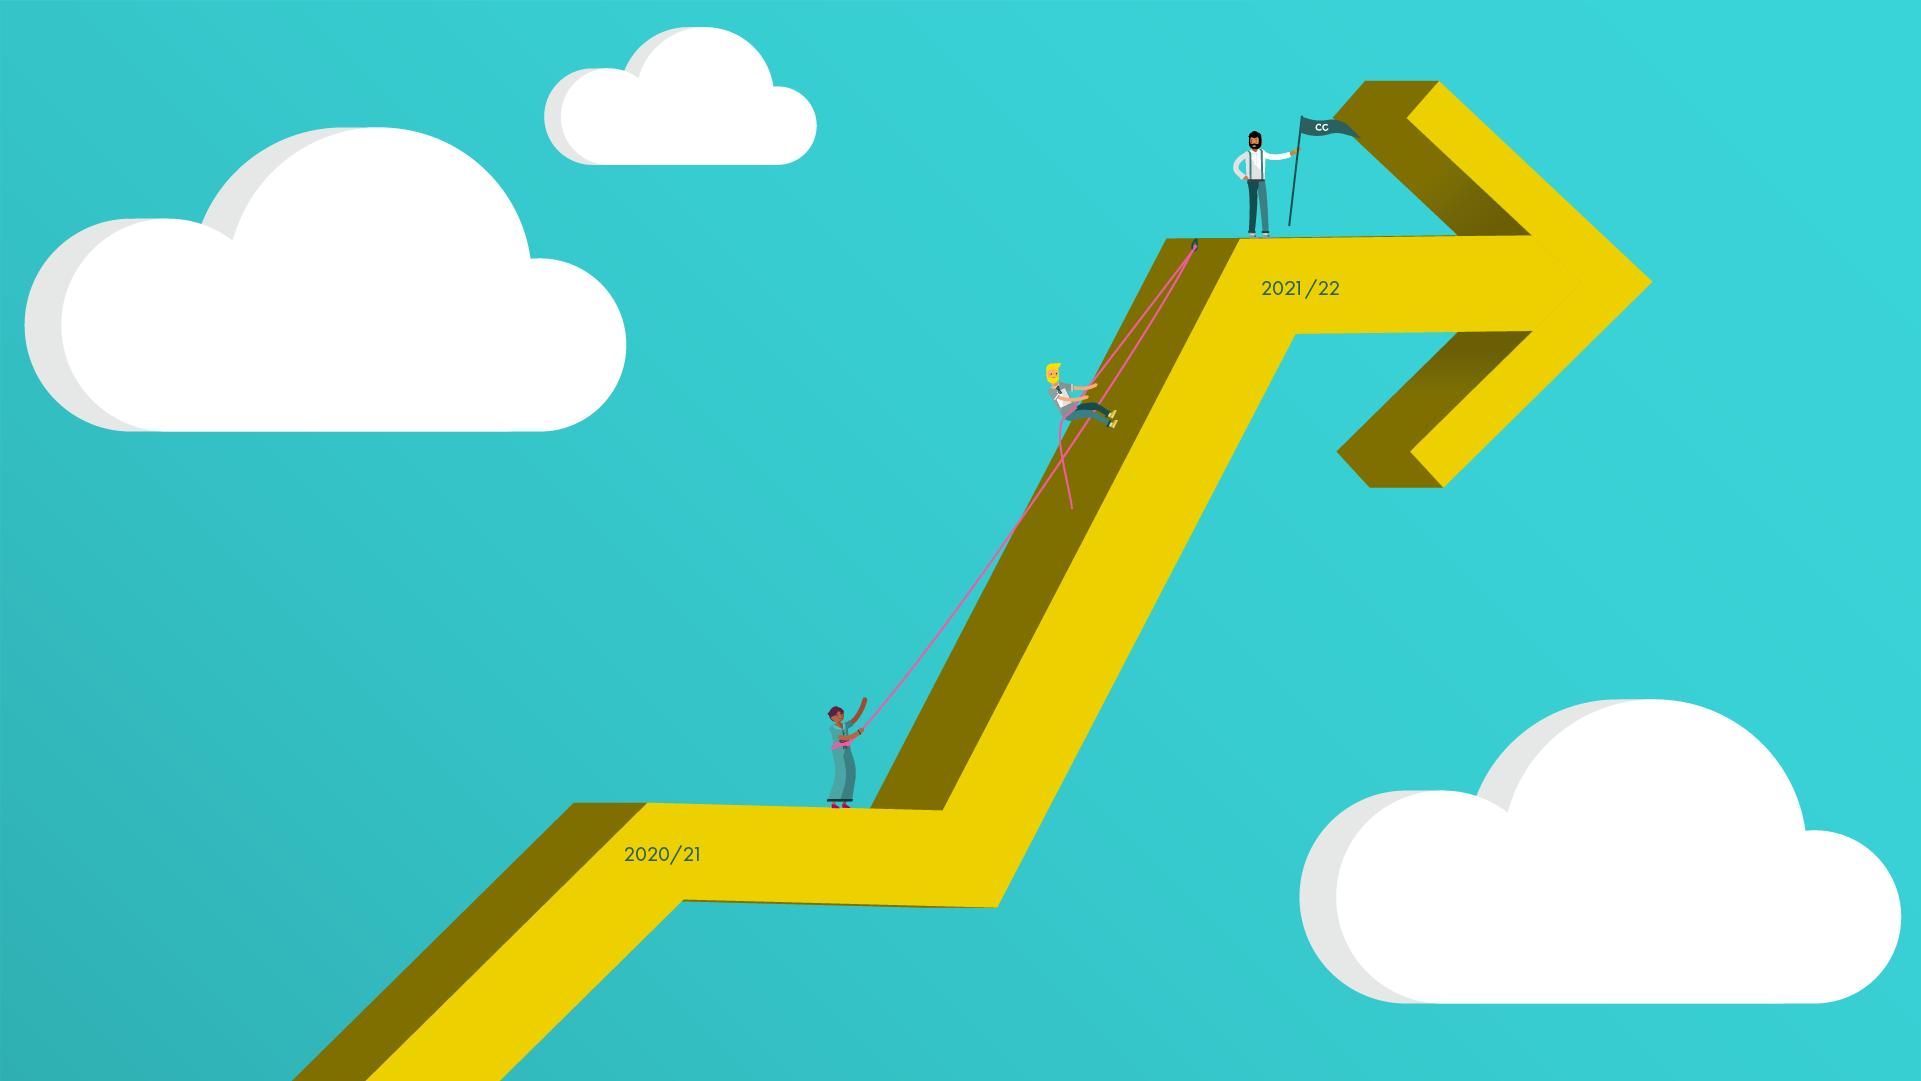 Top 5 Video Marketing Metrics to Track Performance